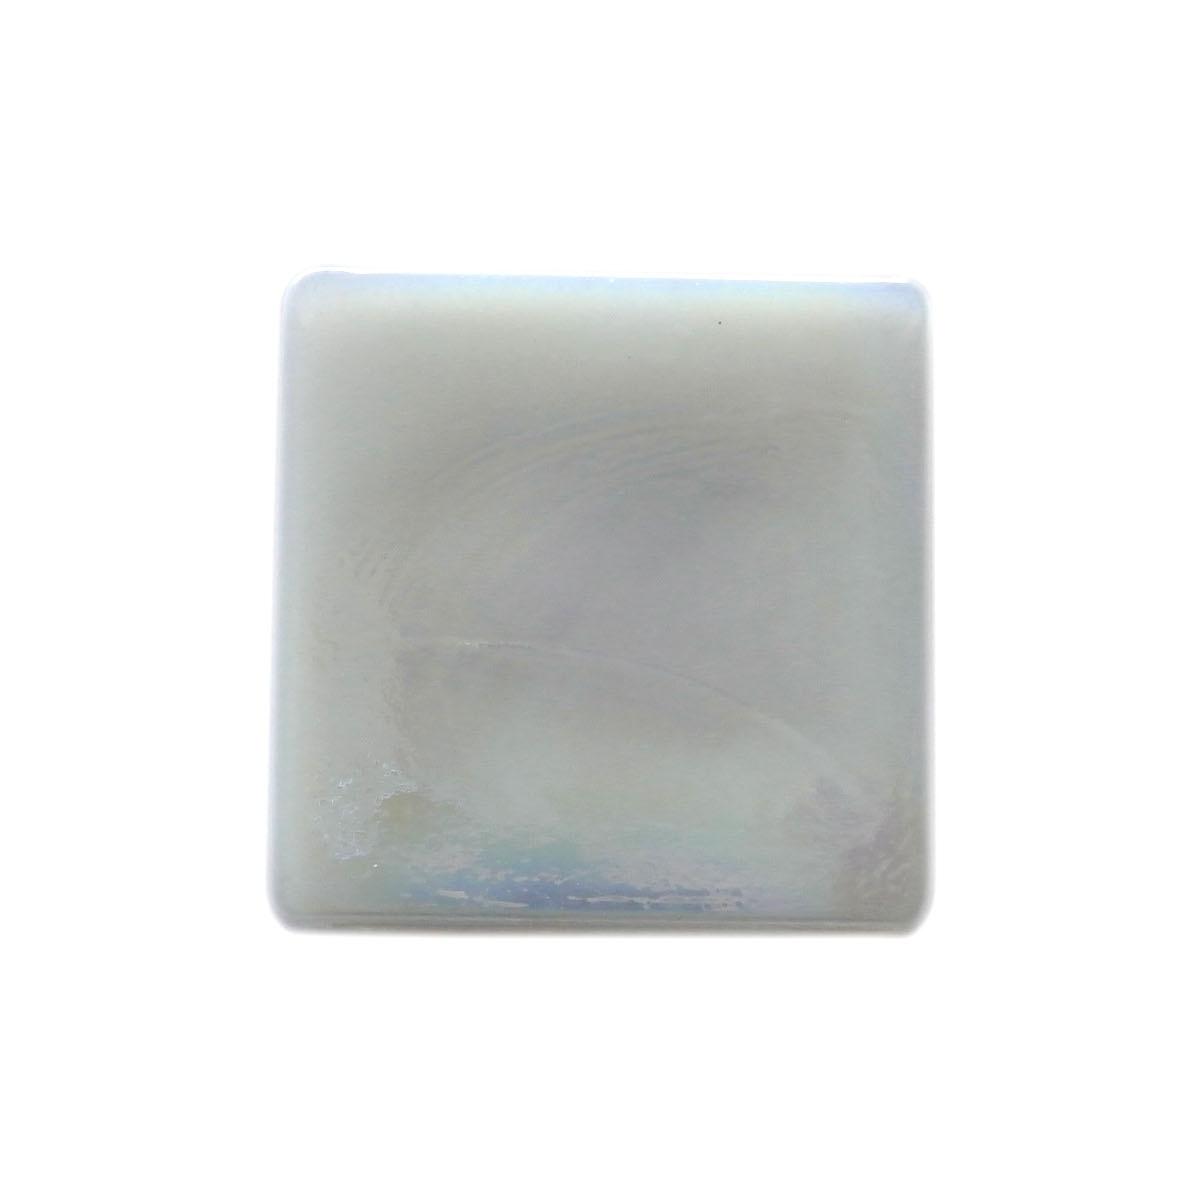 "Atmosphere 2"" x 2"" Glossy Iridescent White Glass Loose Backsplash Mosaic Wall & Floor Tile"